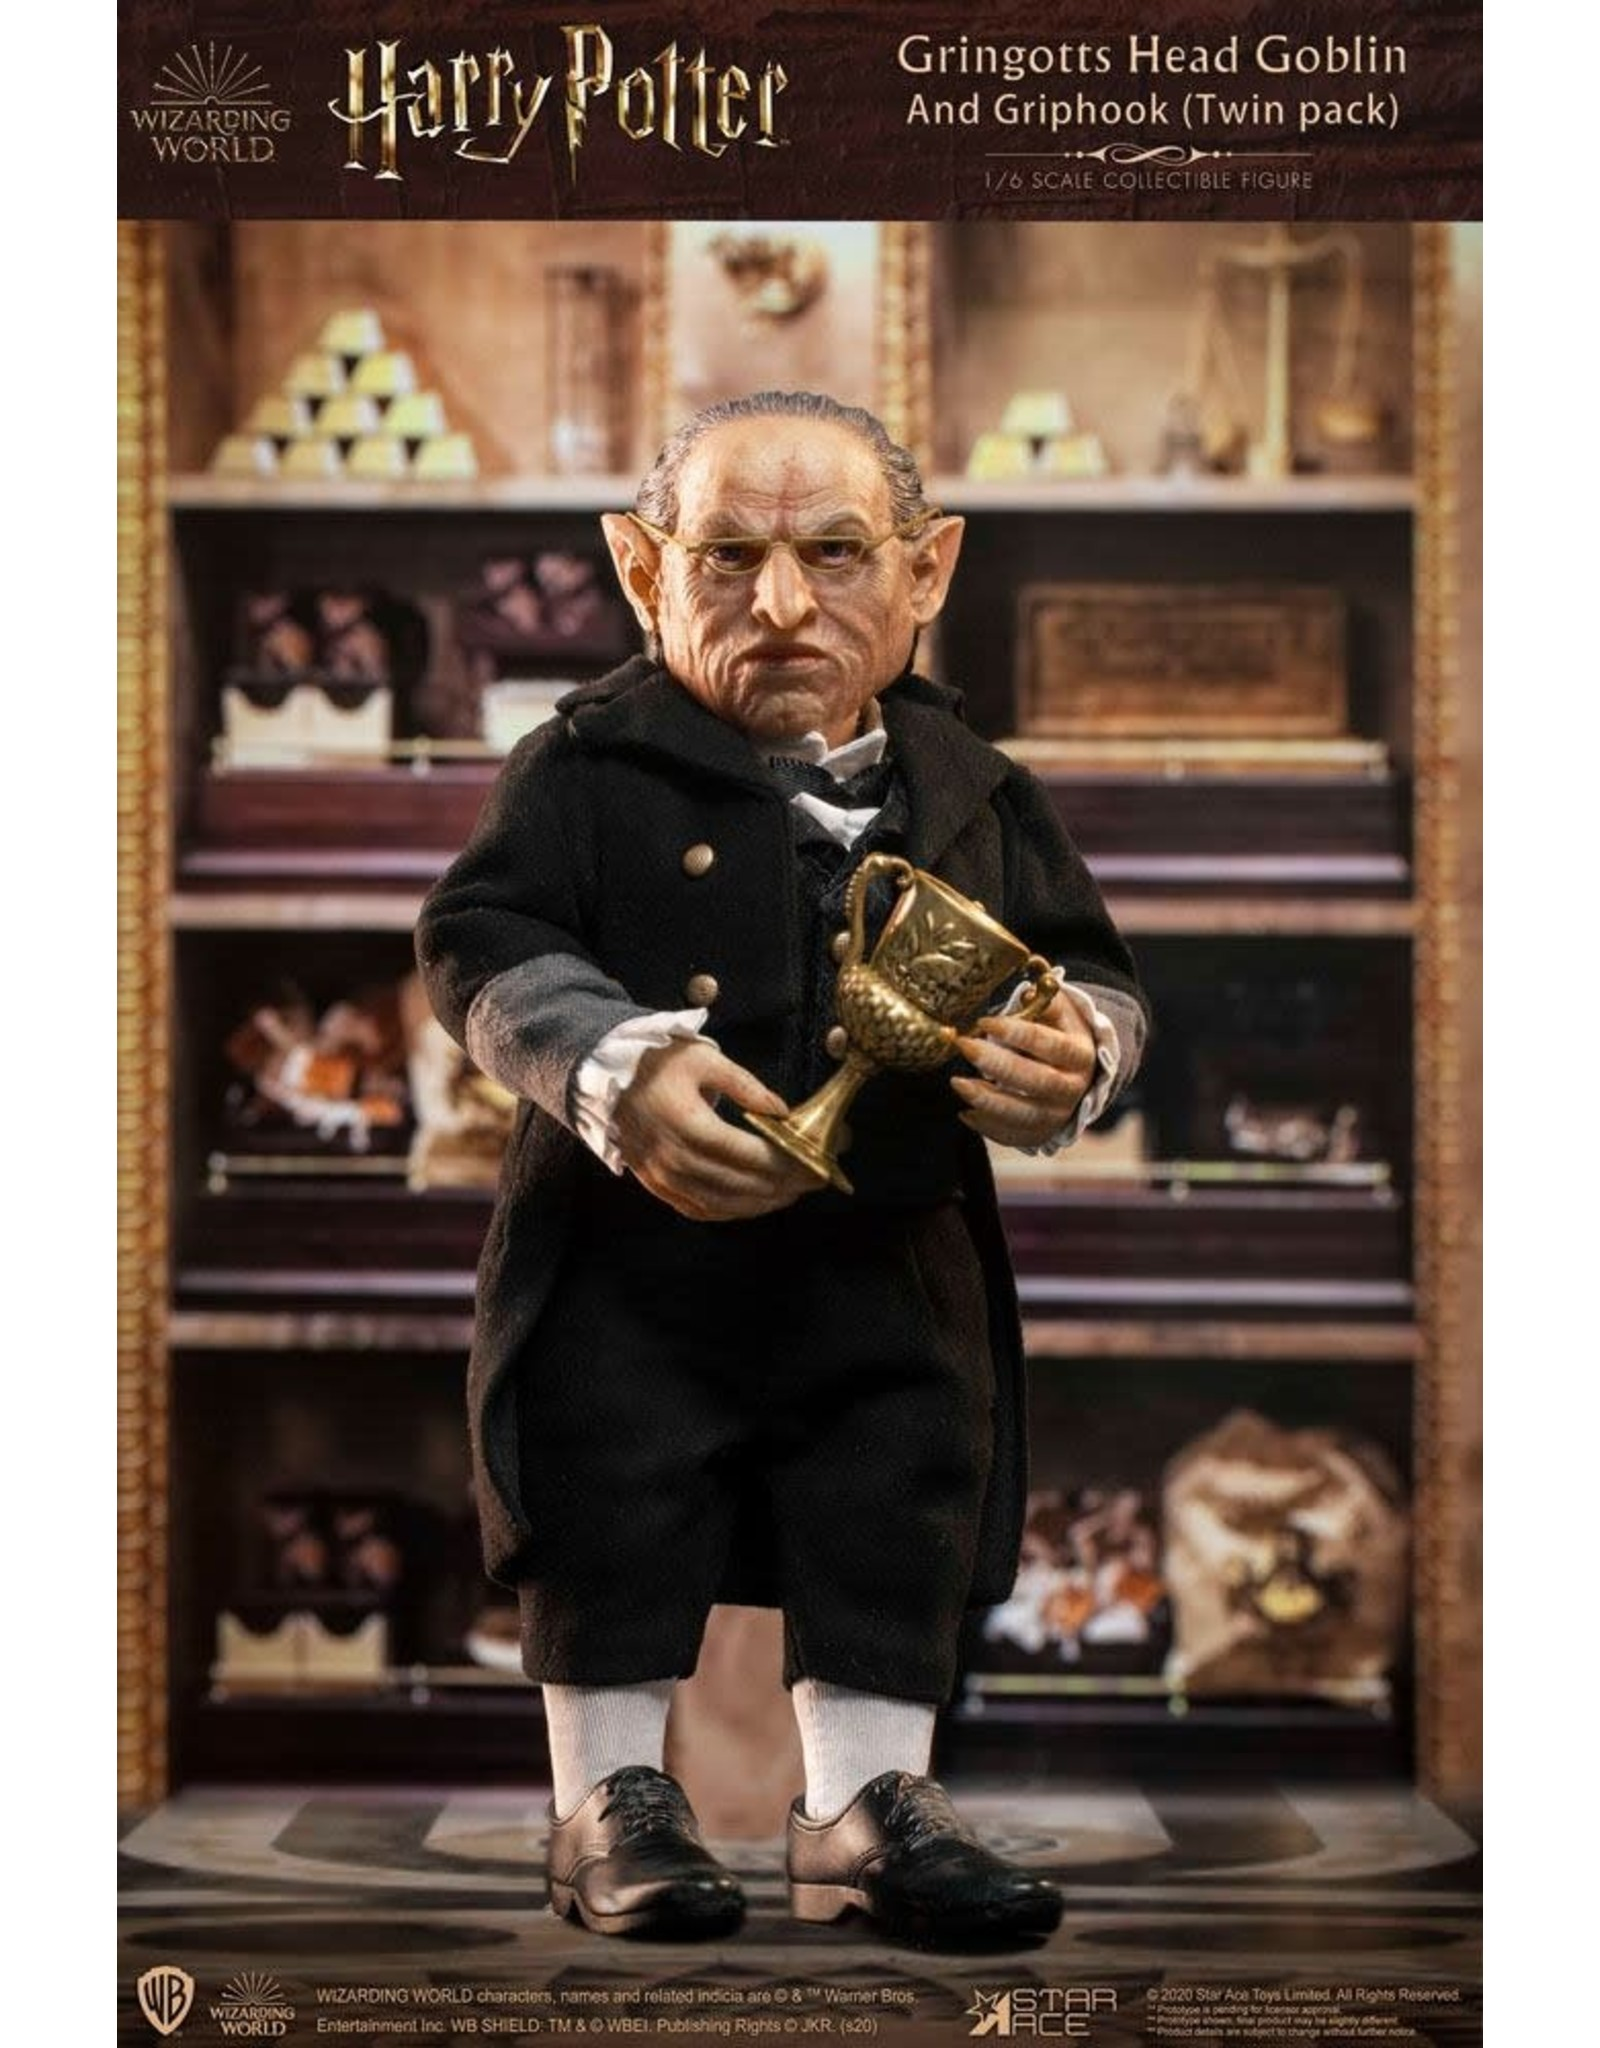 Star Ace Toys HARRY POTTER My Favourite Movie 1/6 Scale Model - Gringotts Head Goblin & Griphook